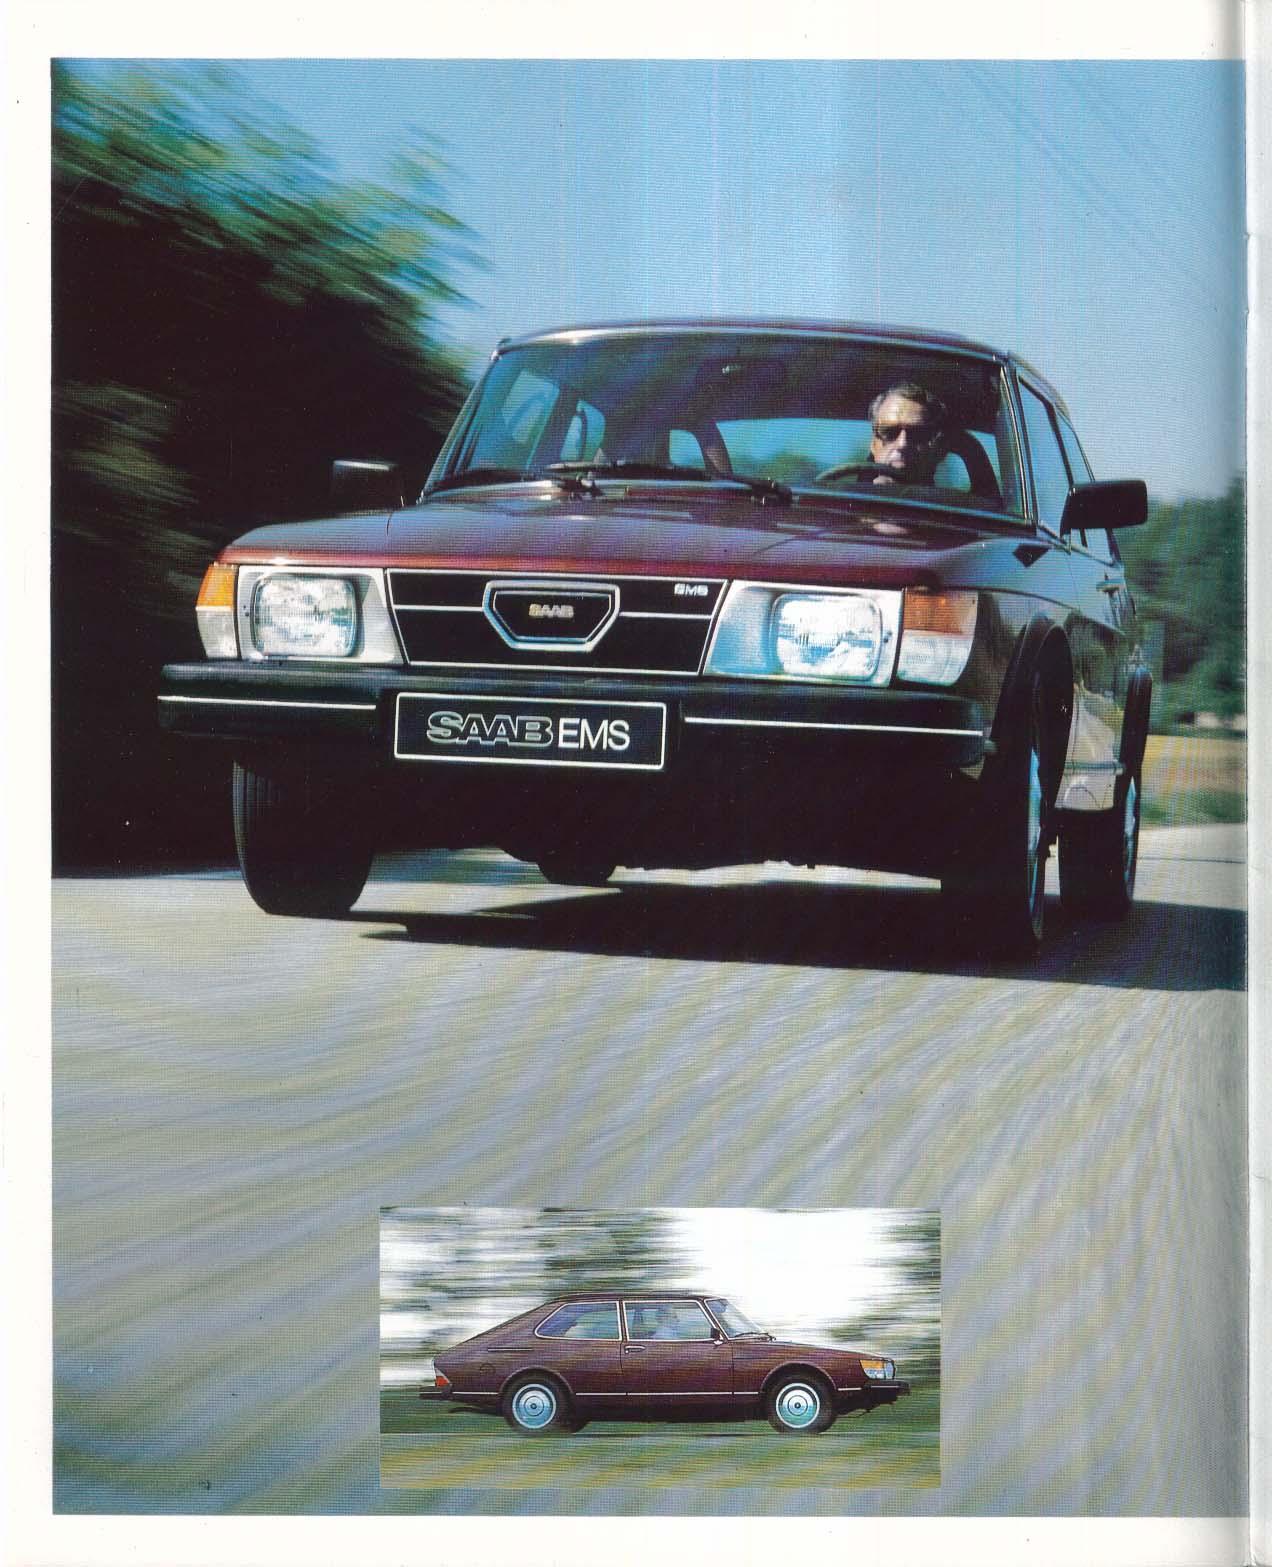 Image for 1979 Saab 900 GLI GLE EMS Turbo brochure